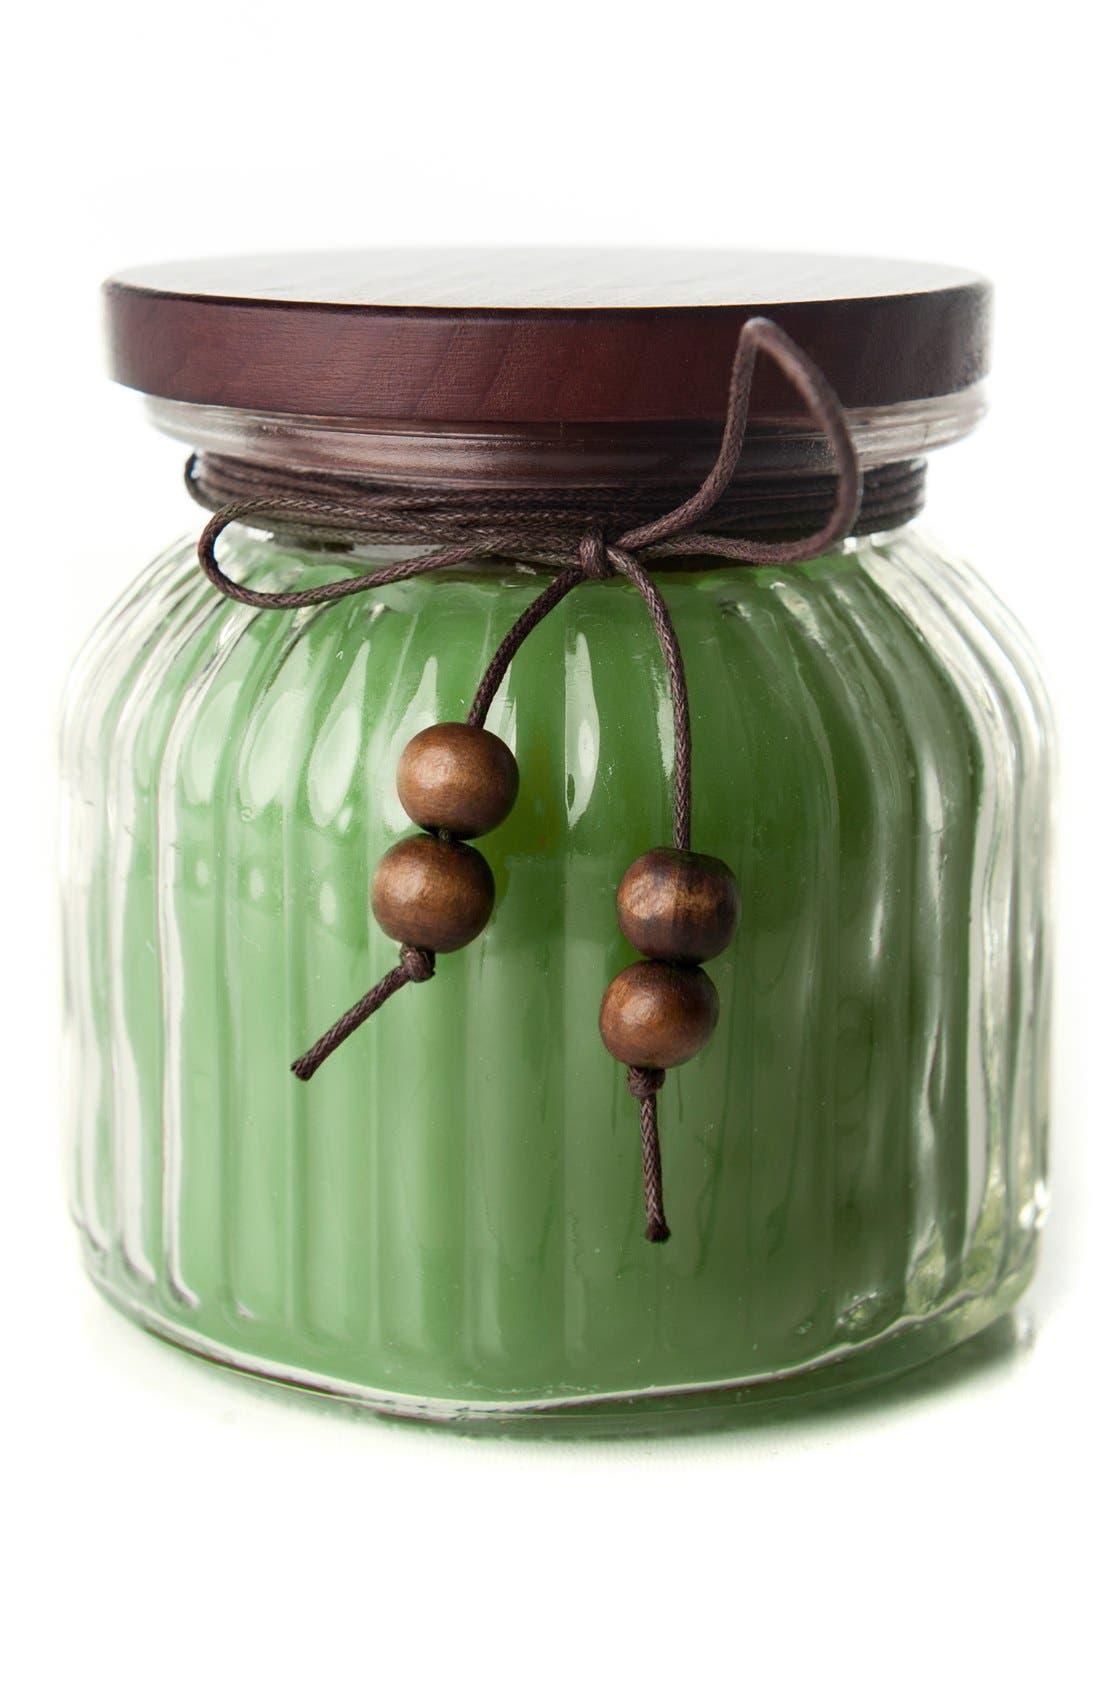 Alternate Image 1 Selected - Amazing Flameless Candle Glass Jar Flameless Candle